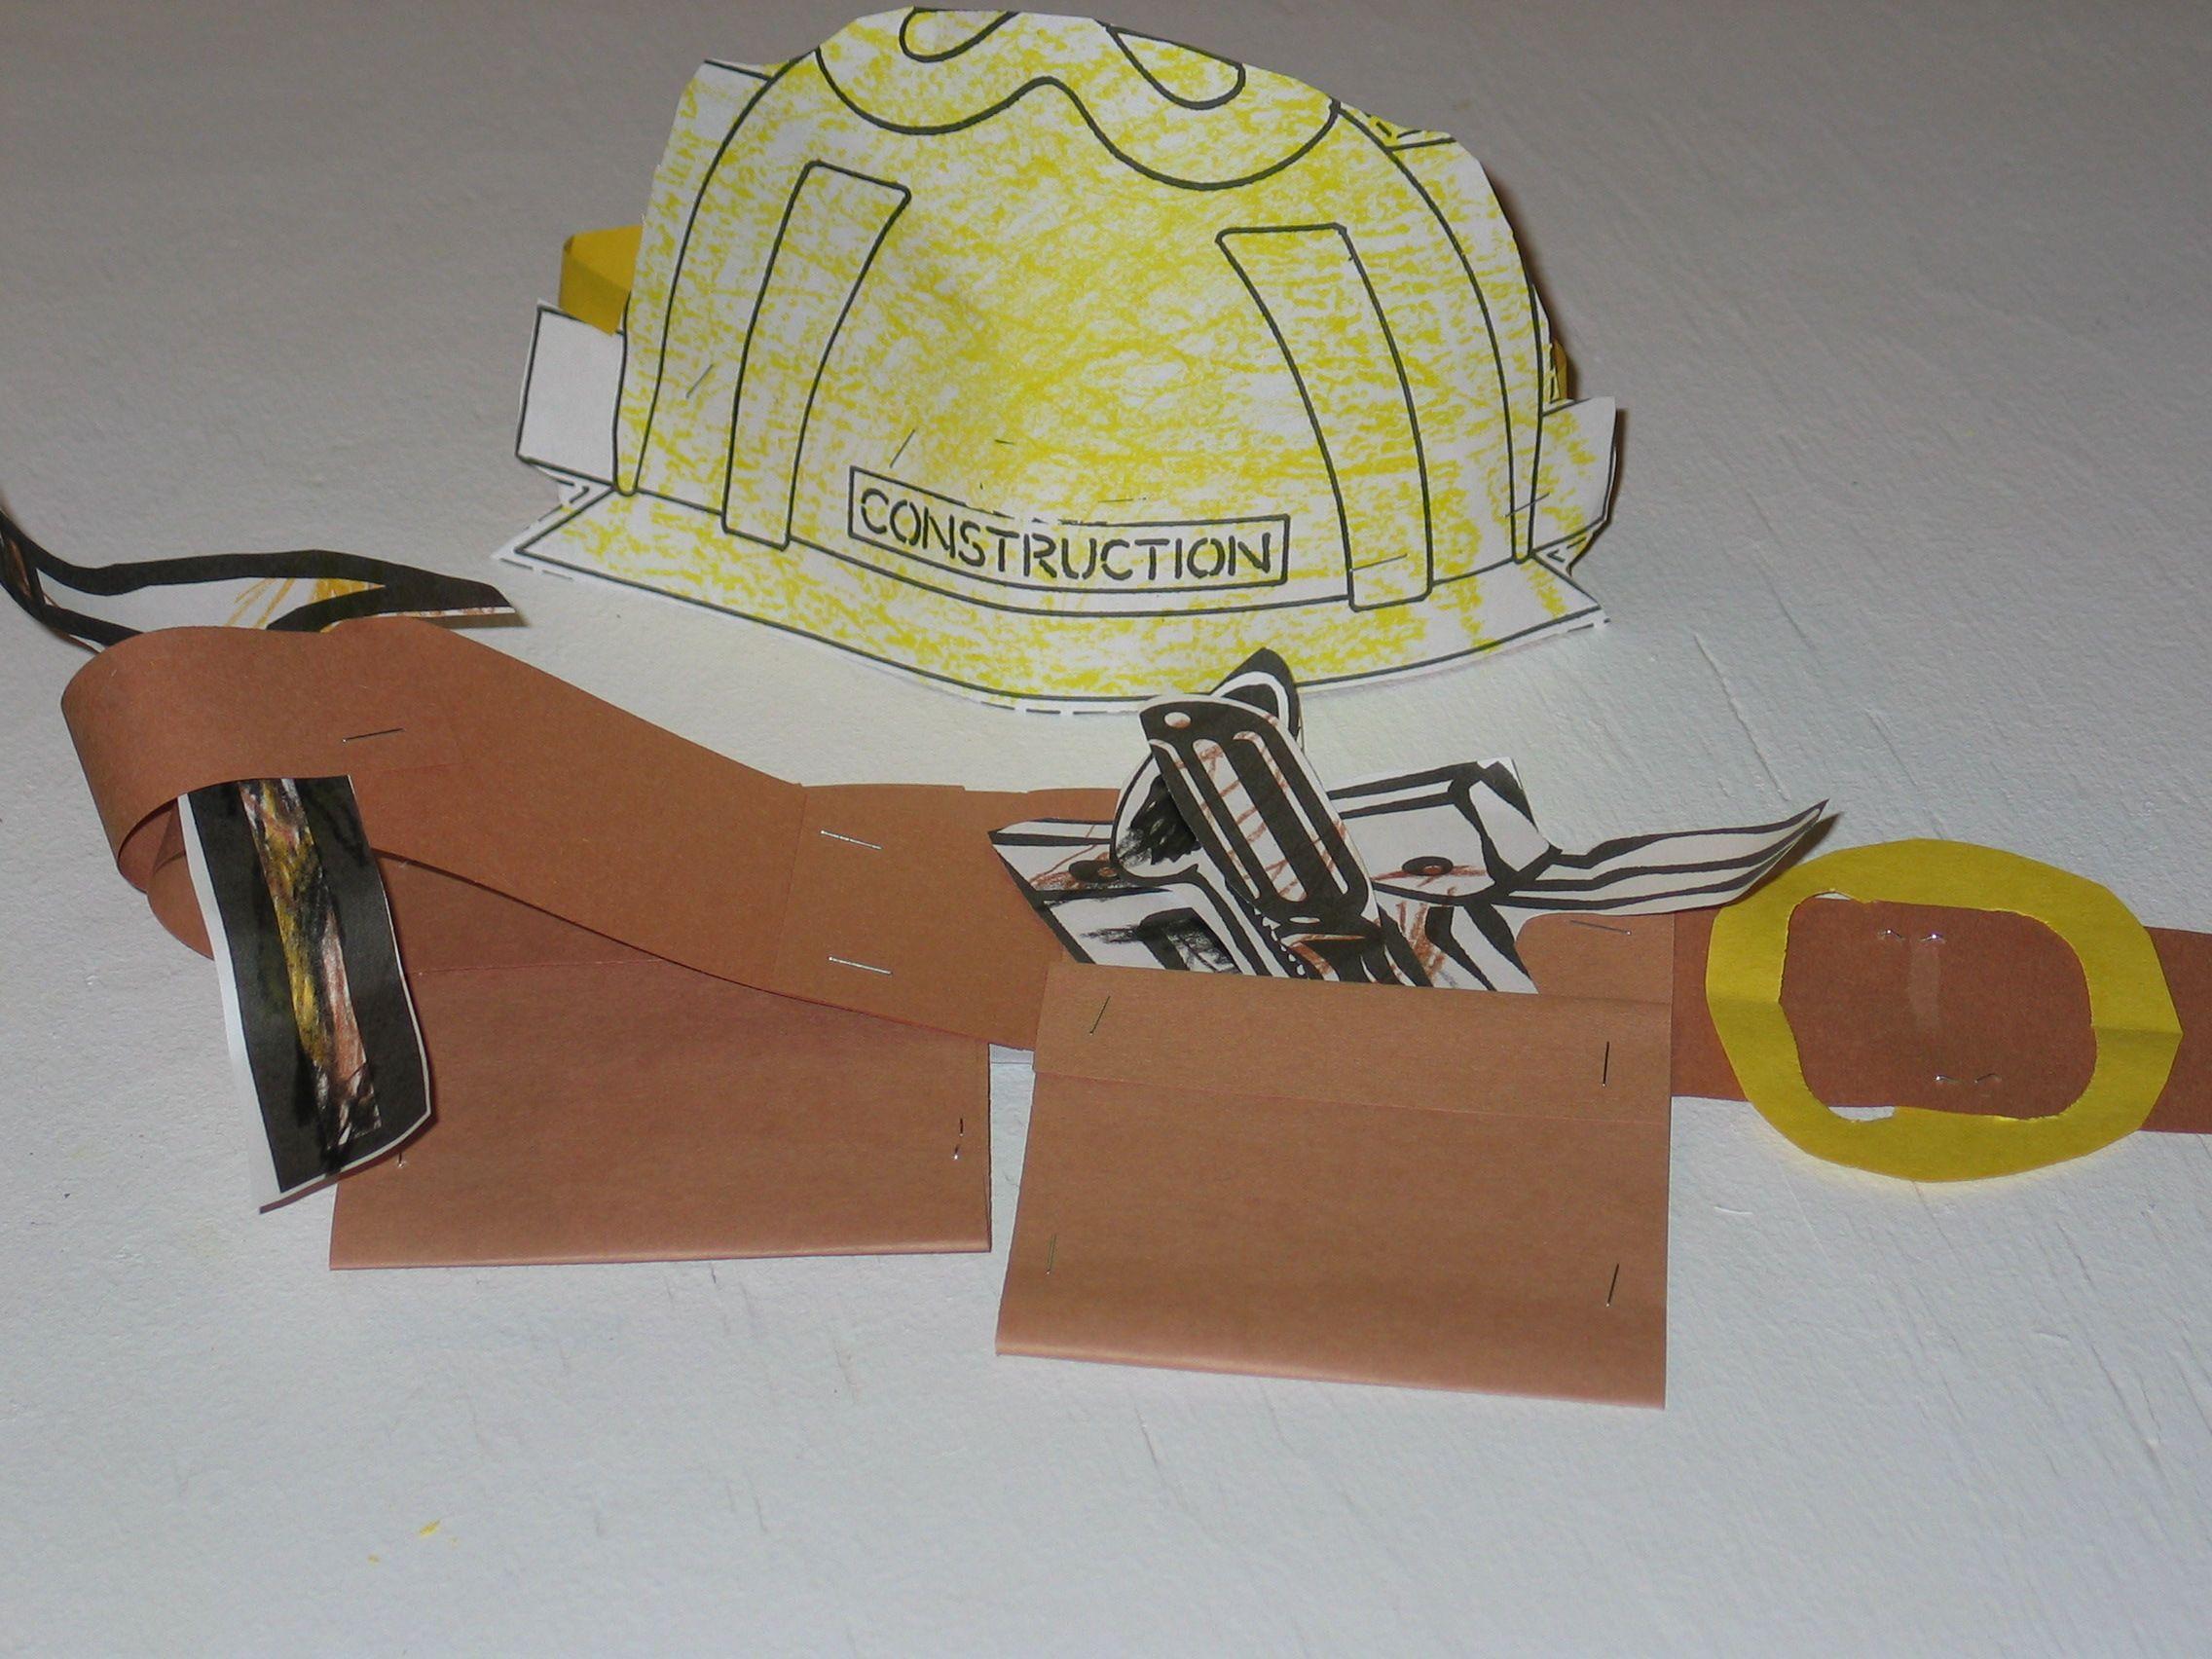 Community Helper Construction Helper